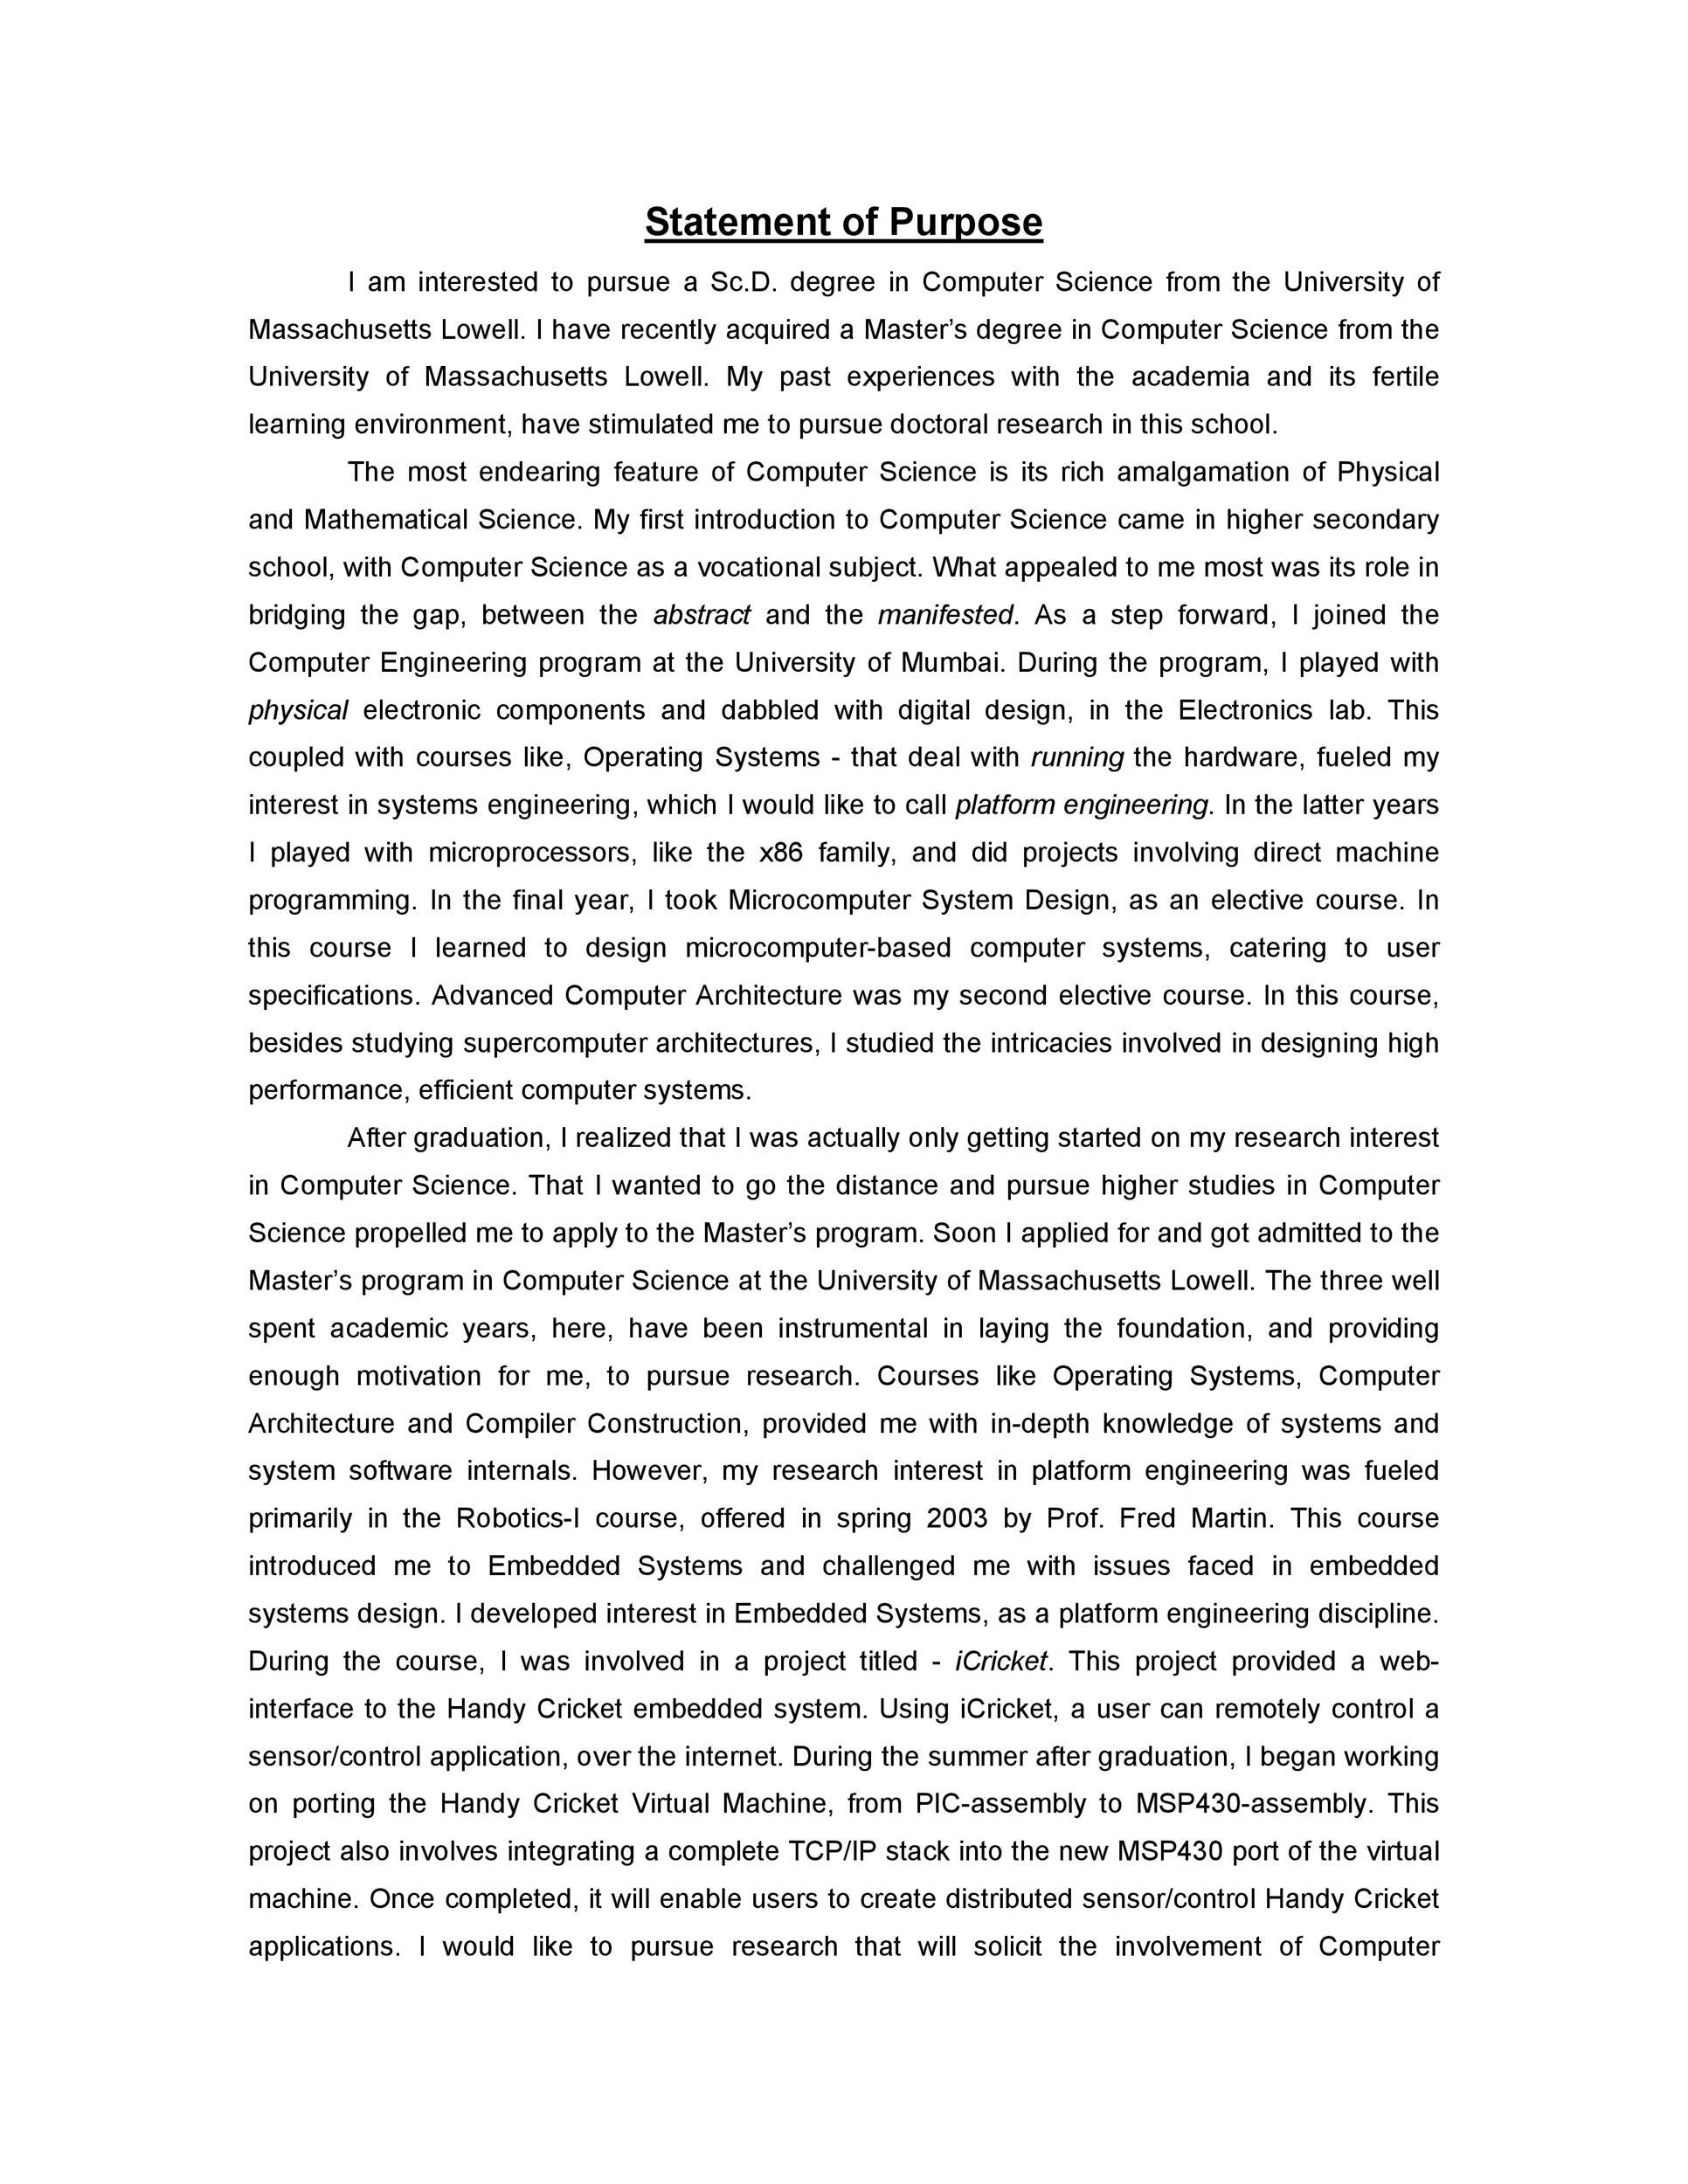 Free statement of purpose example 20